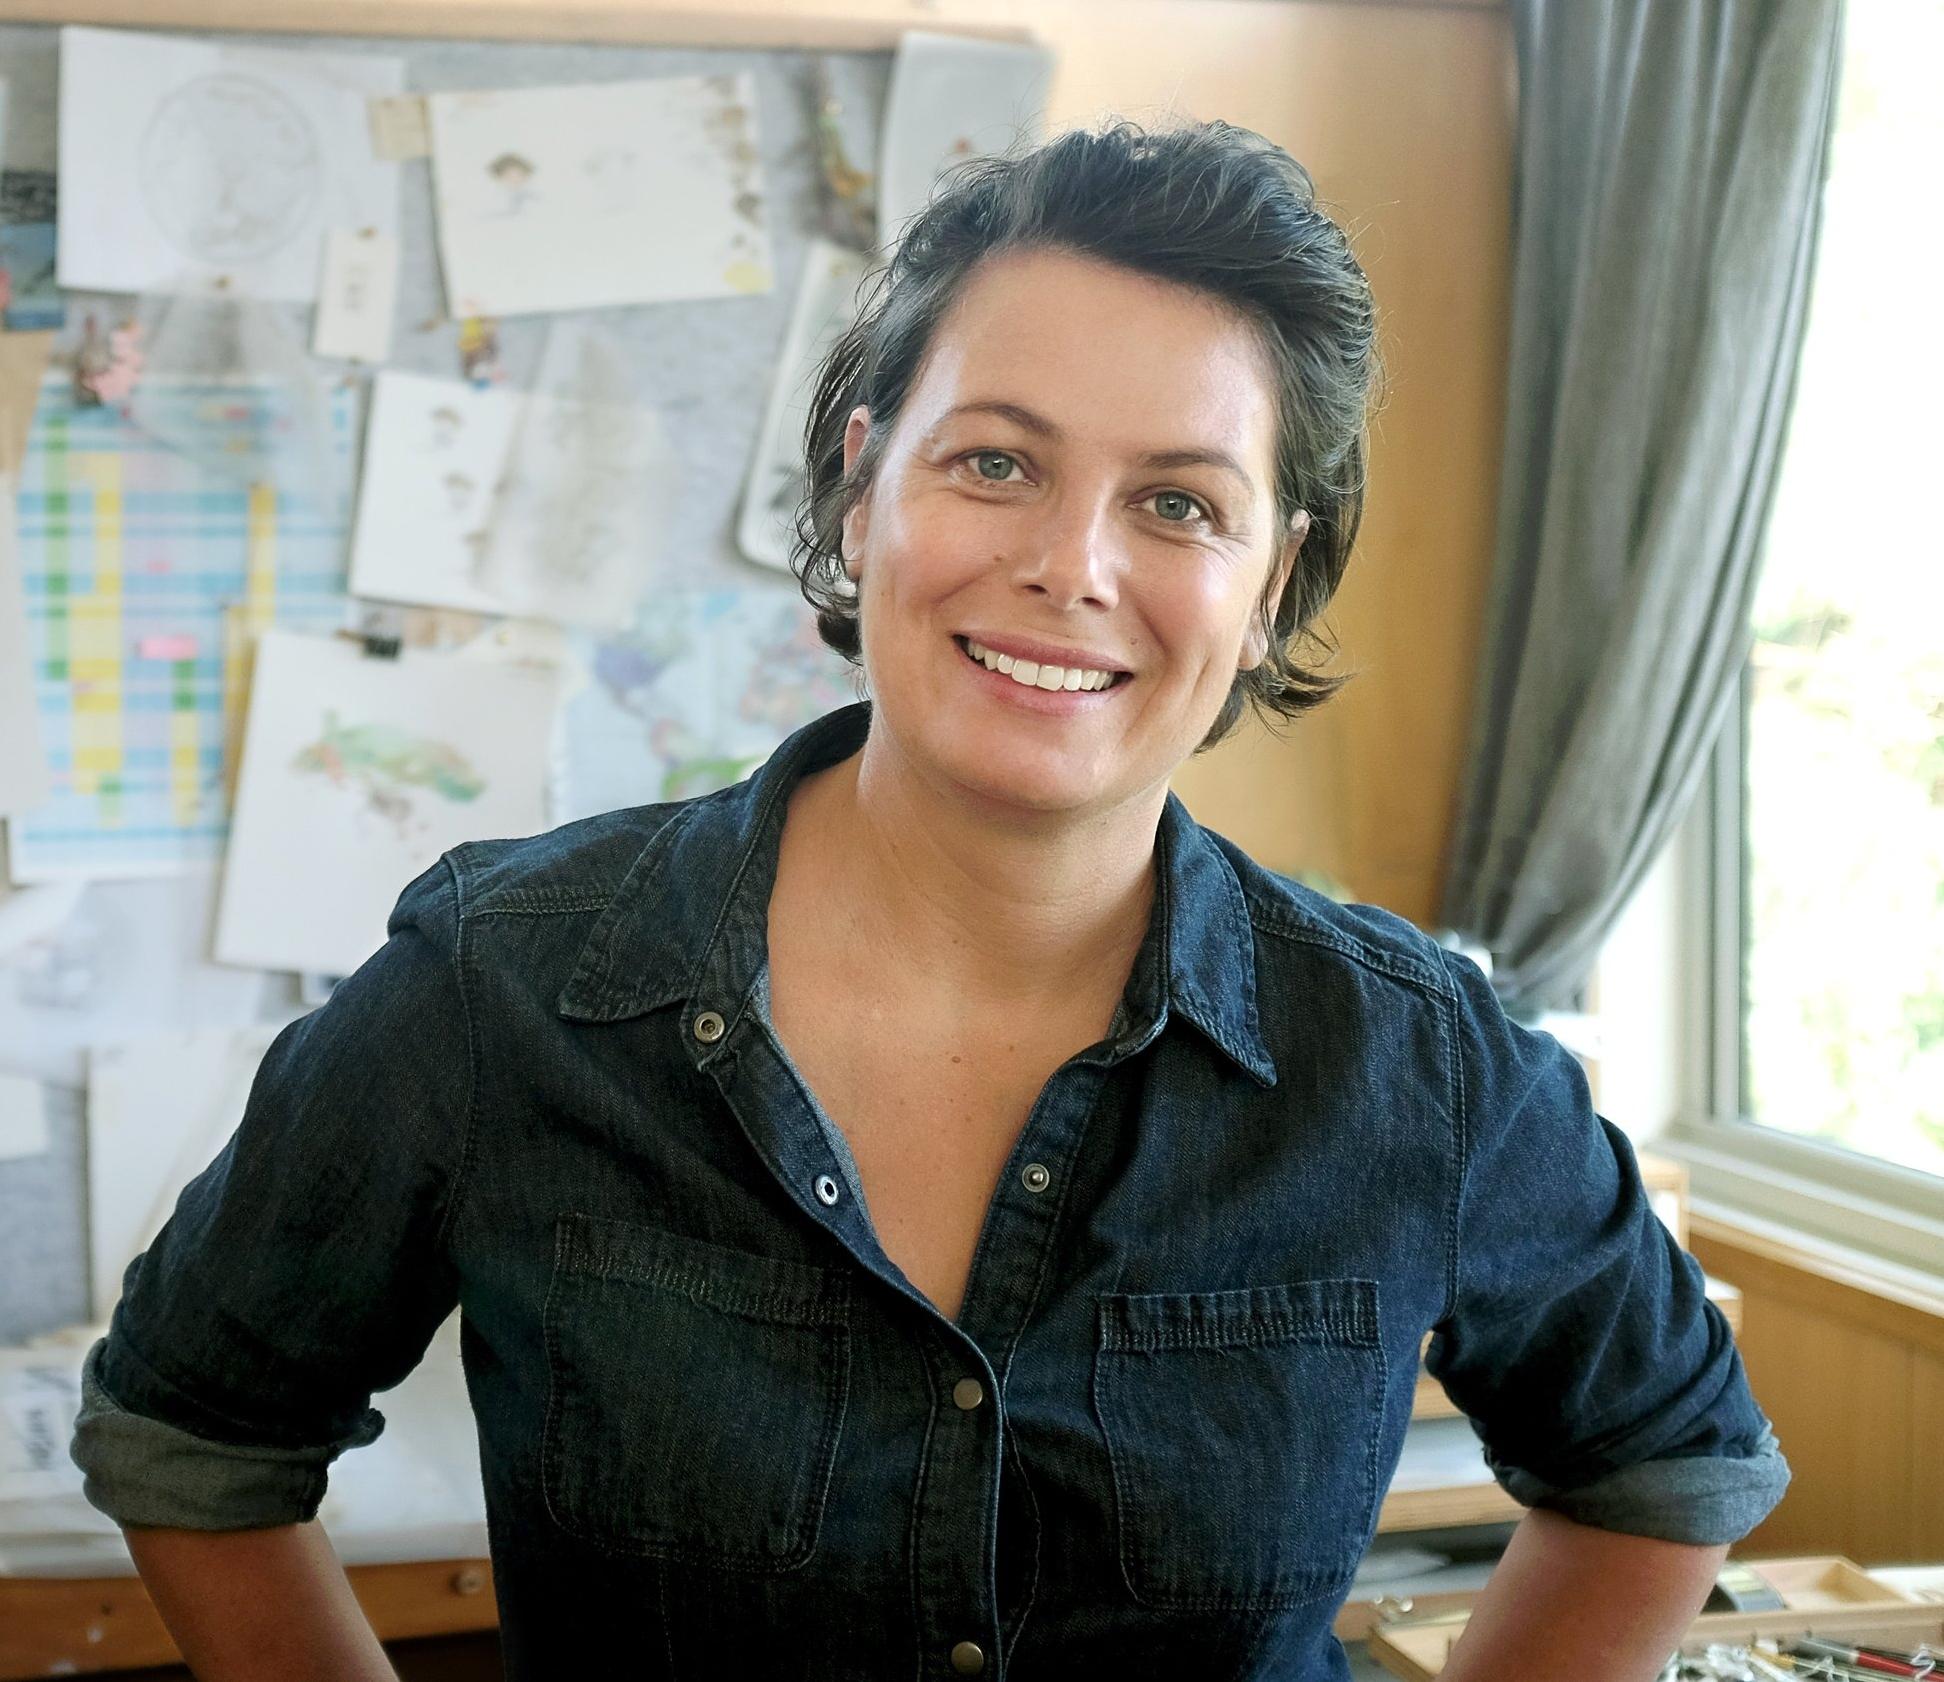 Jedda Robaard is an illustrator and writer of children's books -